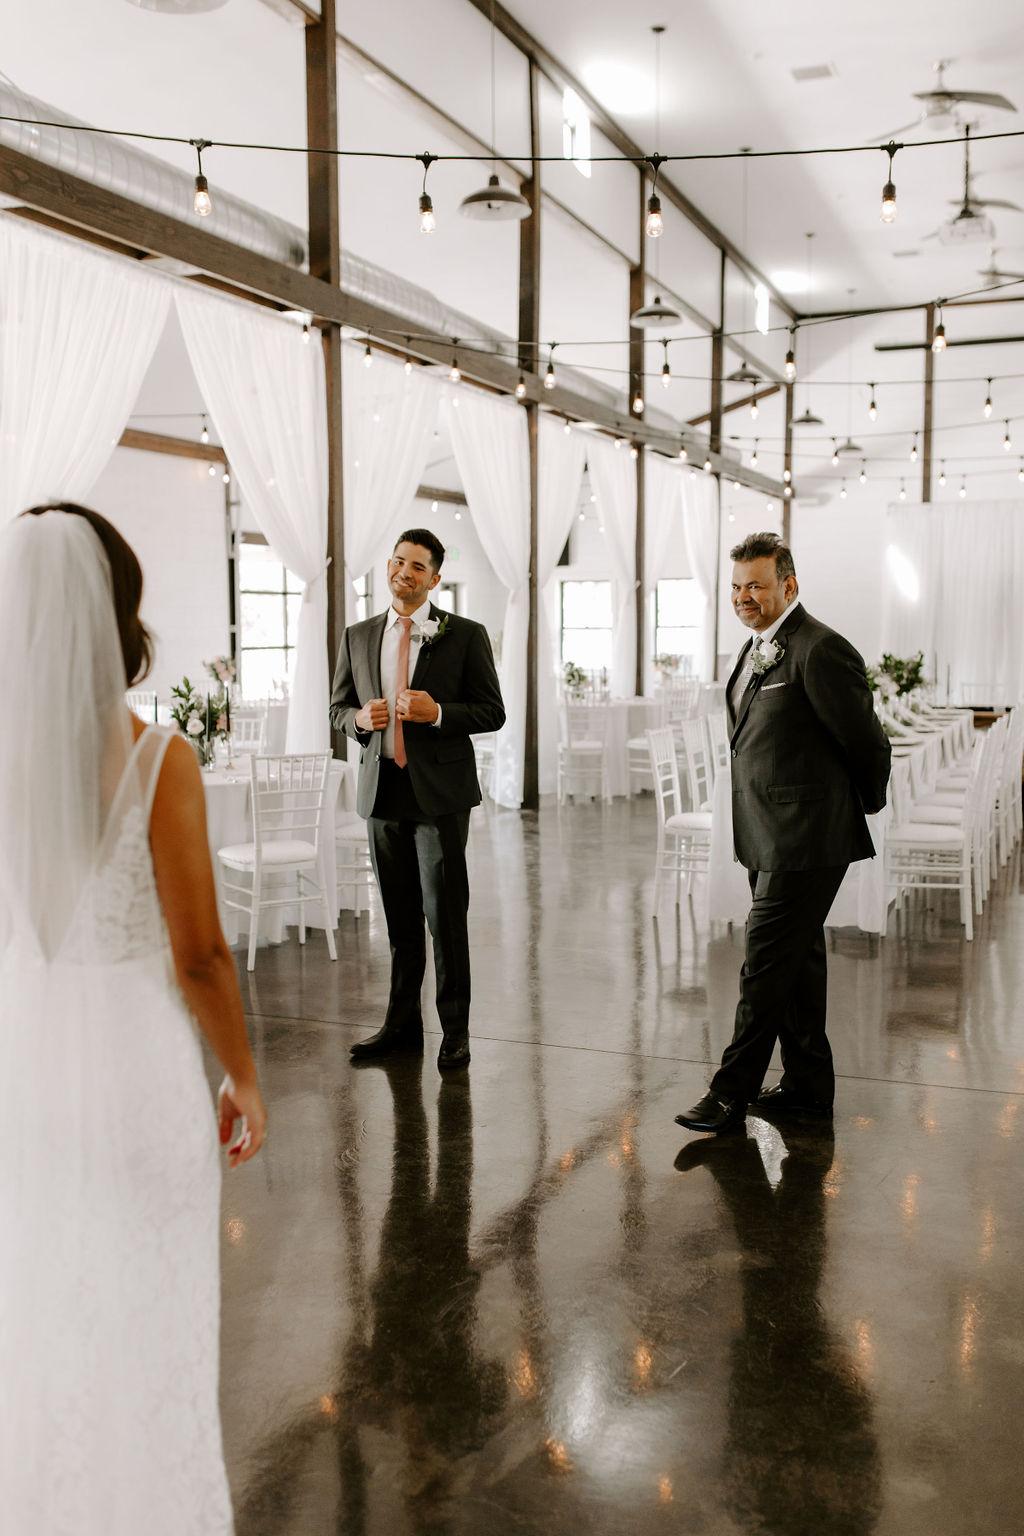 Tulsa White Barn Wedding Venue Outdoor Ceremony 30.jpg